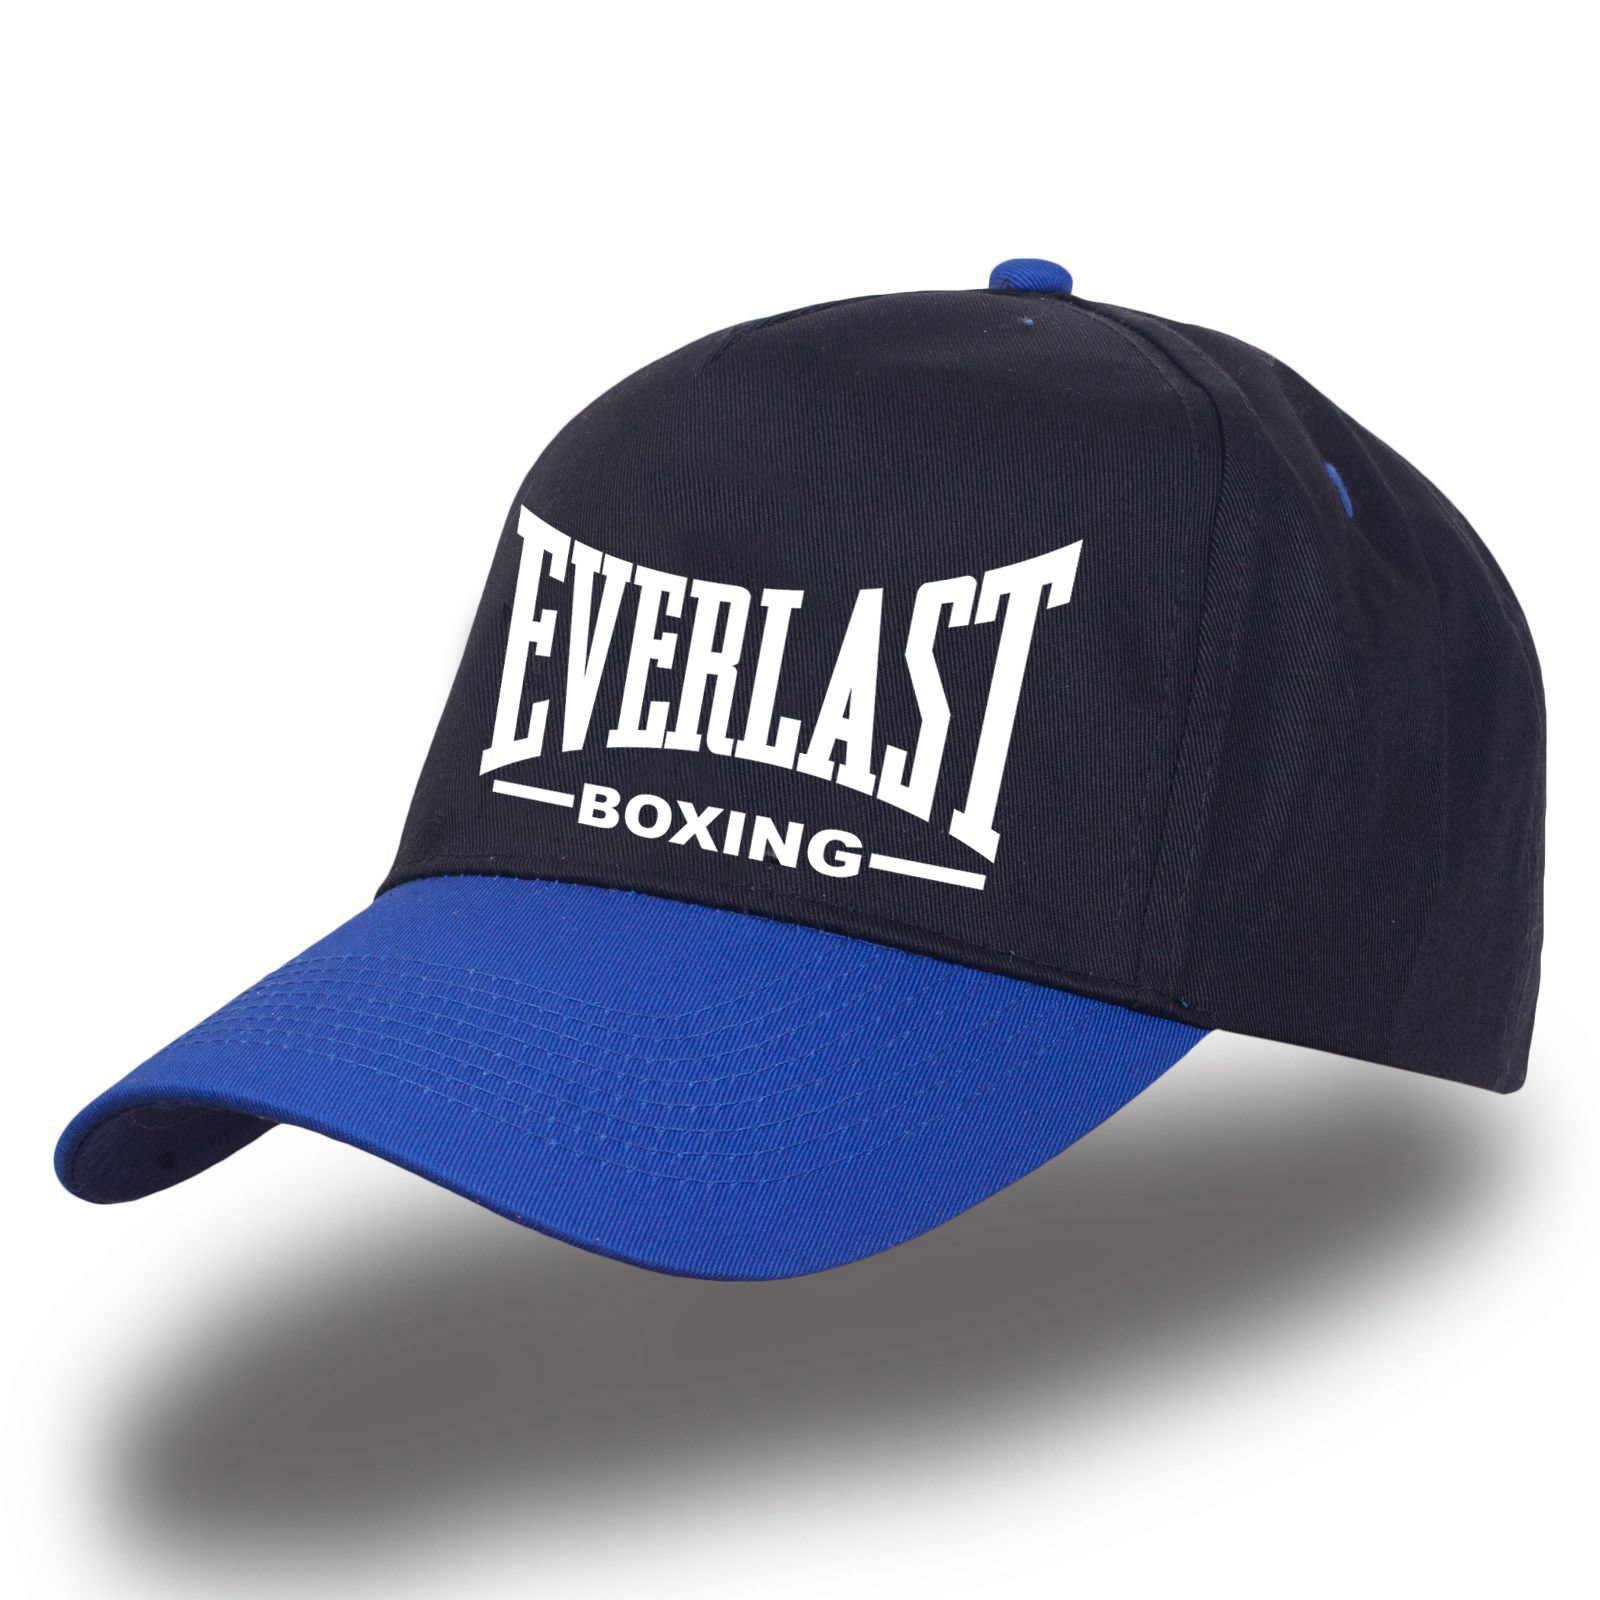 Кепка Everlast - купить онлайн недорого